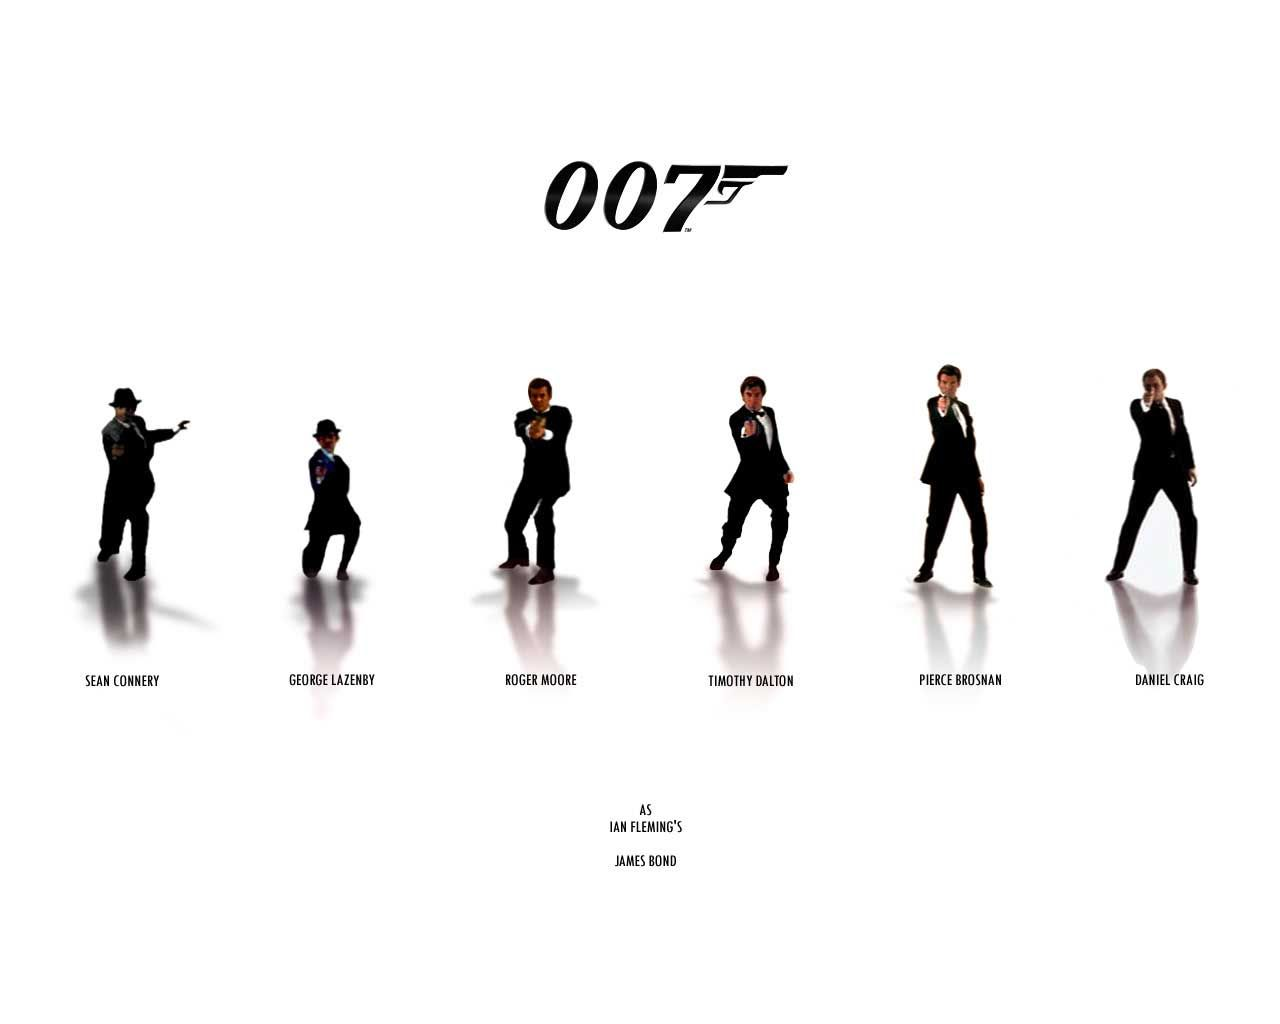 Pin By Emrayfo On Geeking Out James Bond James Bond Movies James Bond Movie Posters